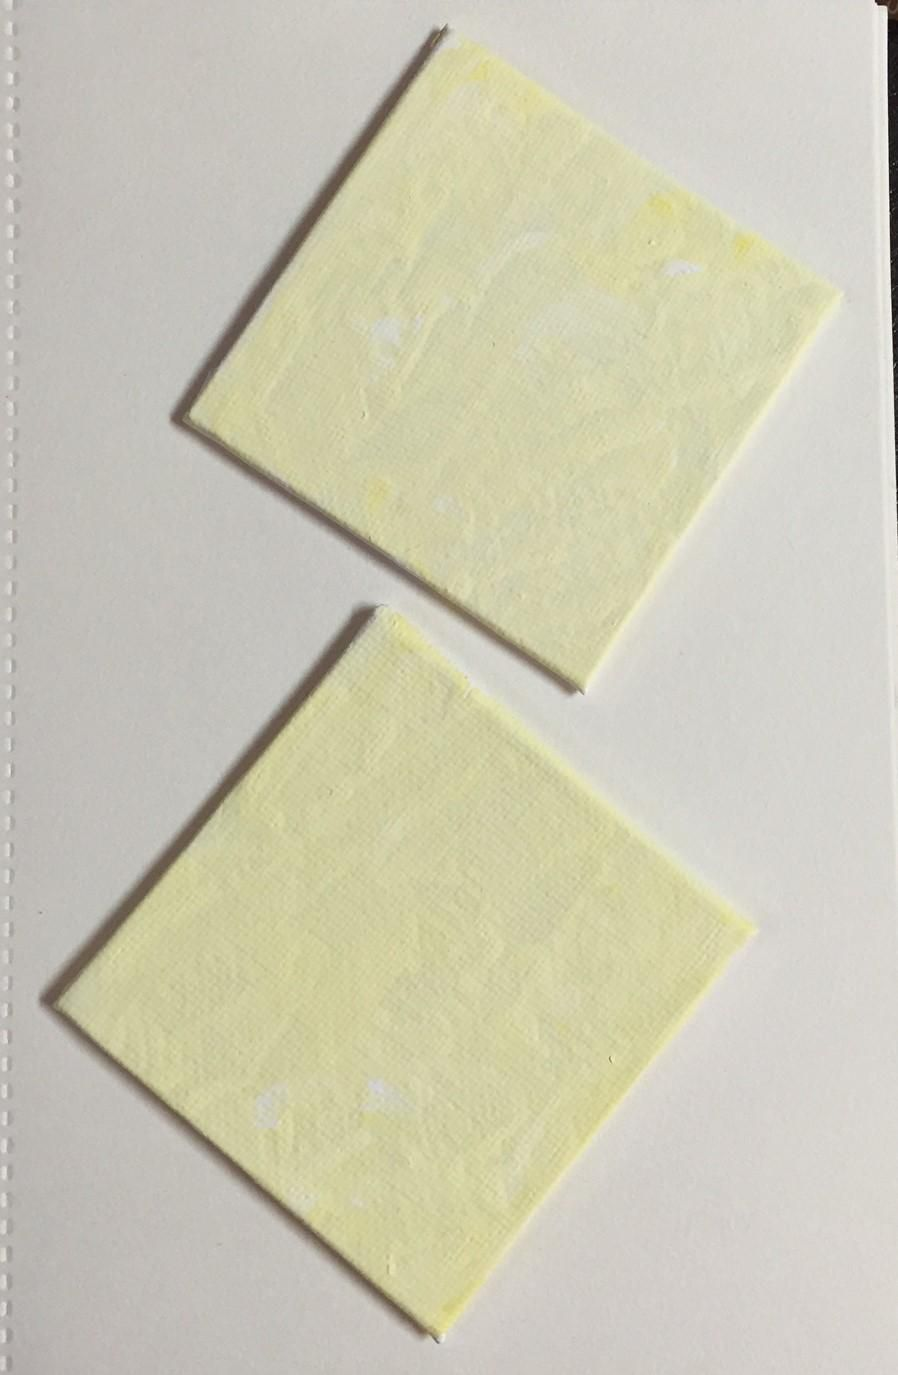 Klee Critter Details - image 9 - student project